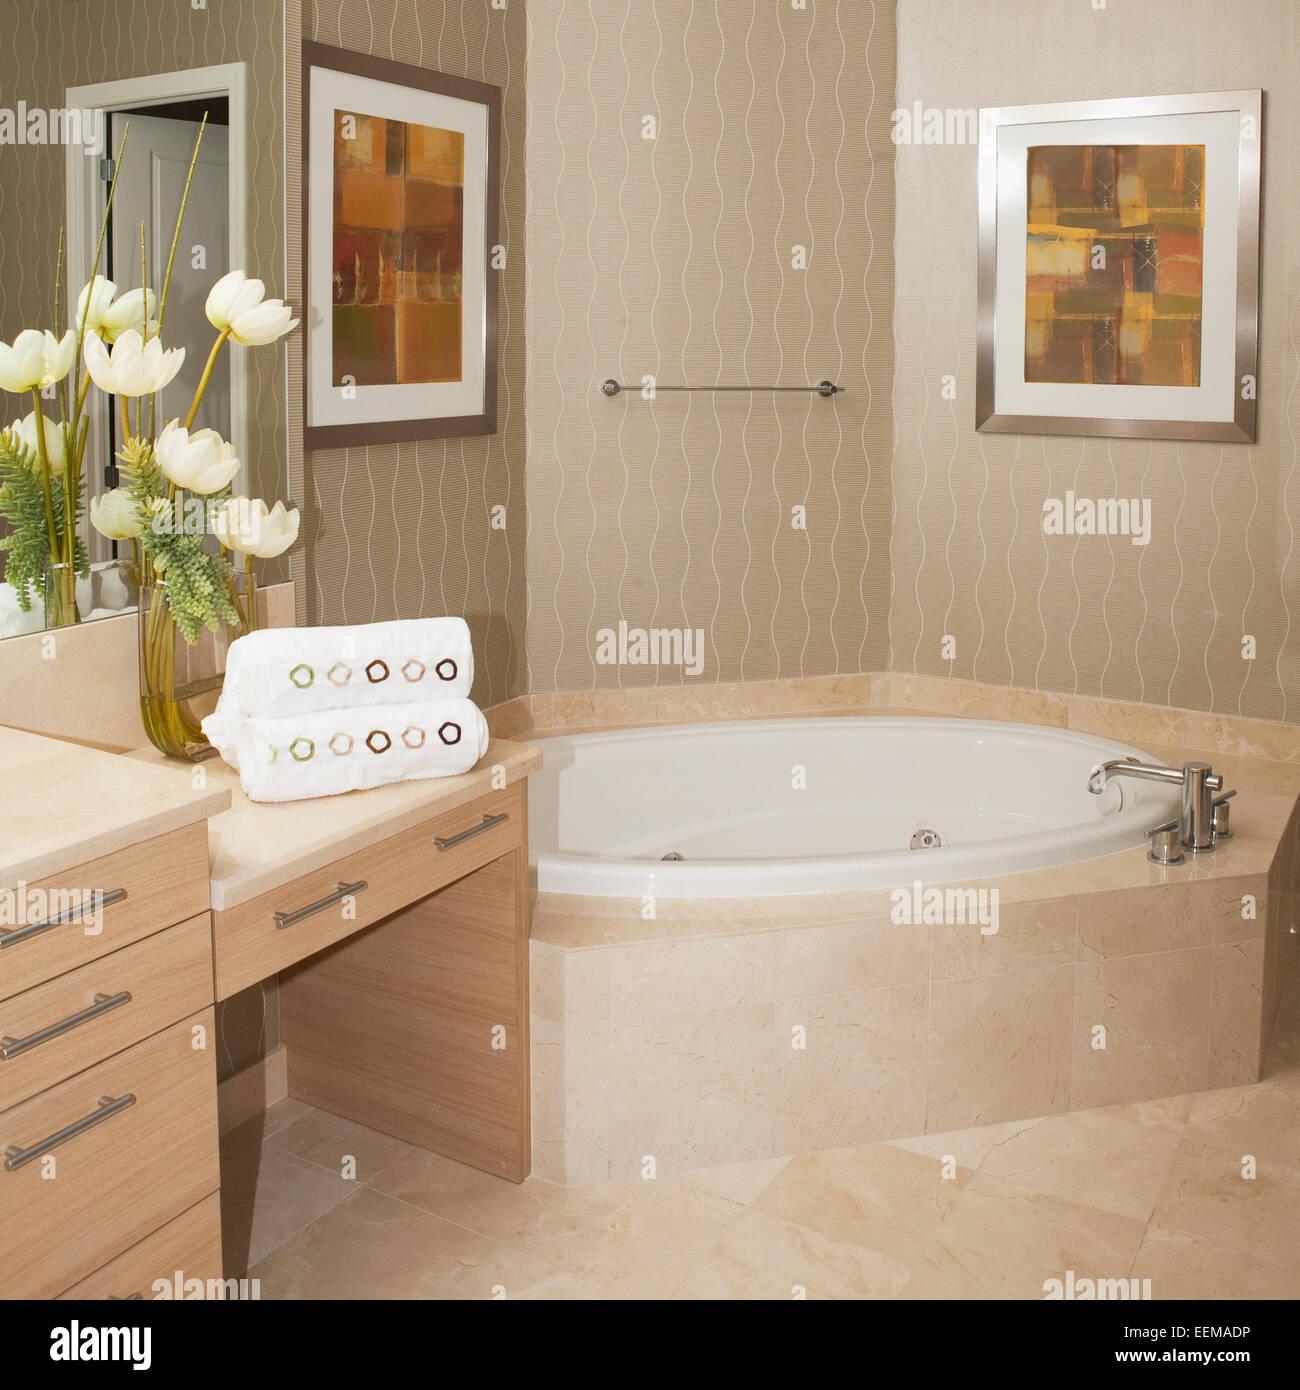 Bathtub Wall Art And Countertops In Bathroom Stock Photo Alamy